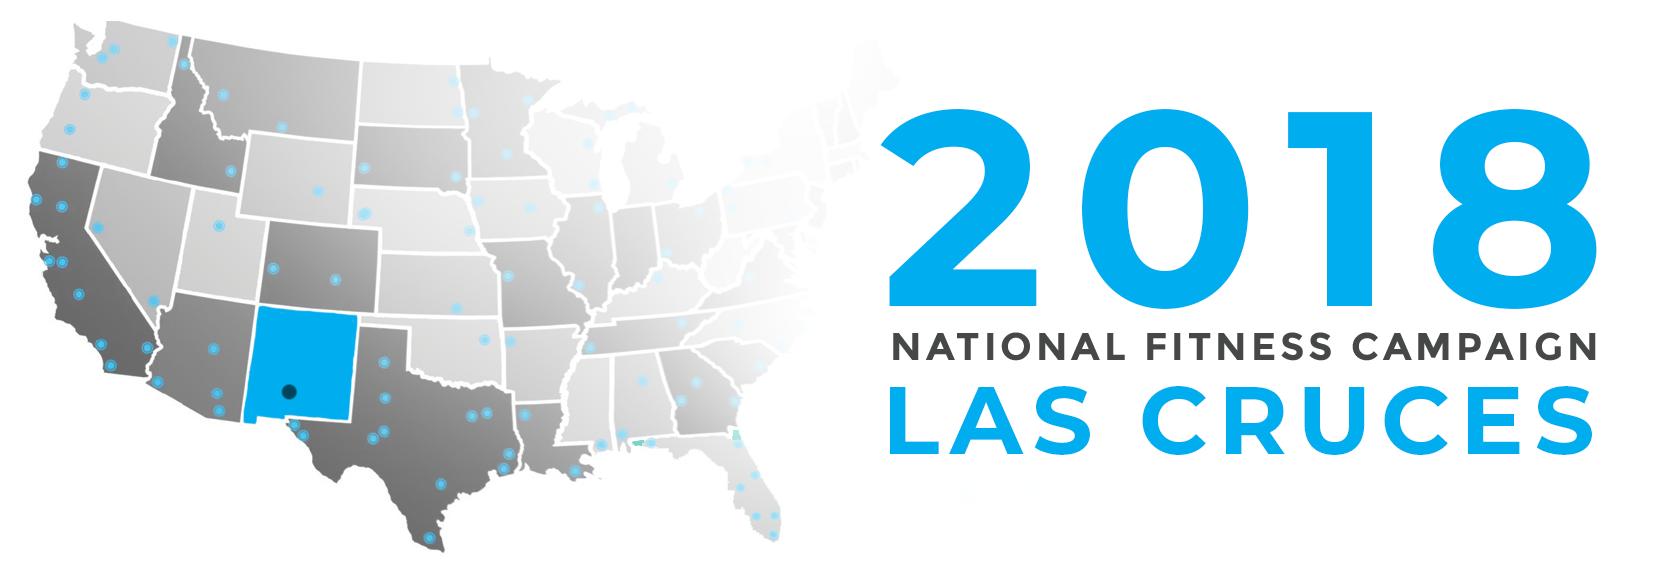 2018 Campaign Logo Las Cruces.png